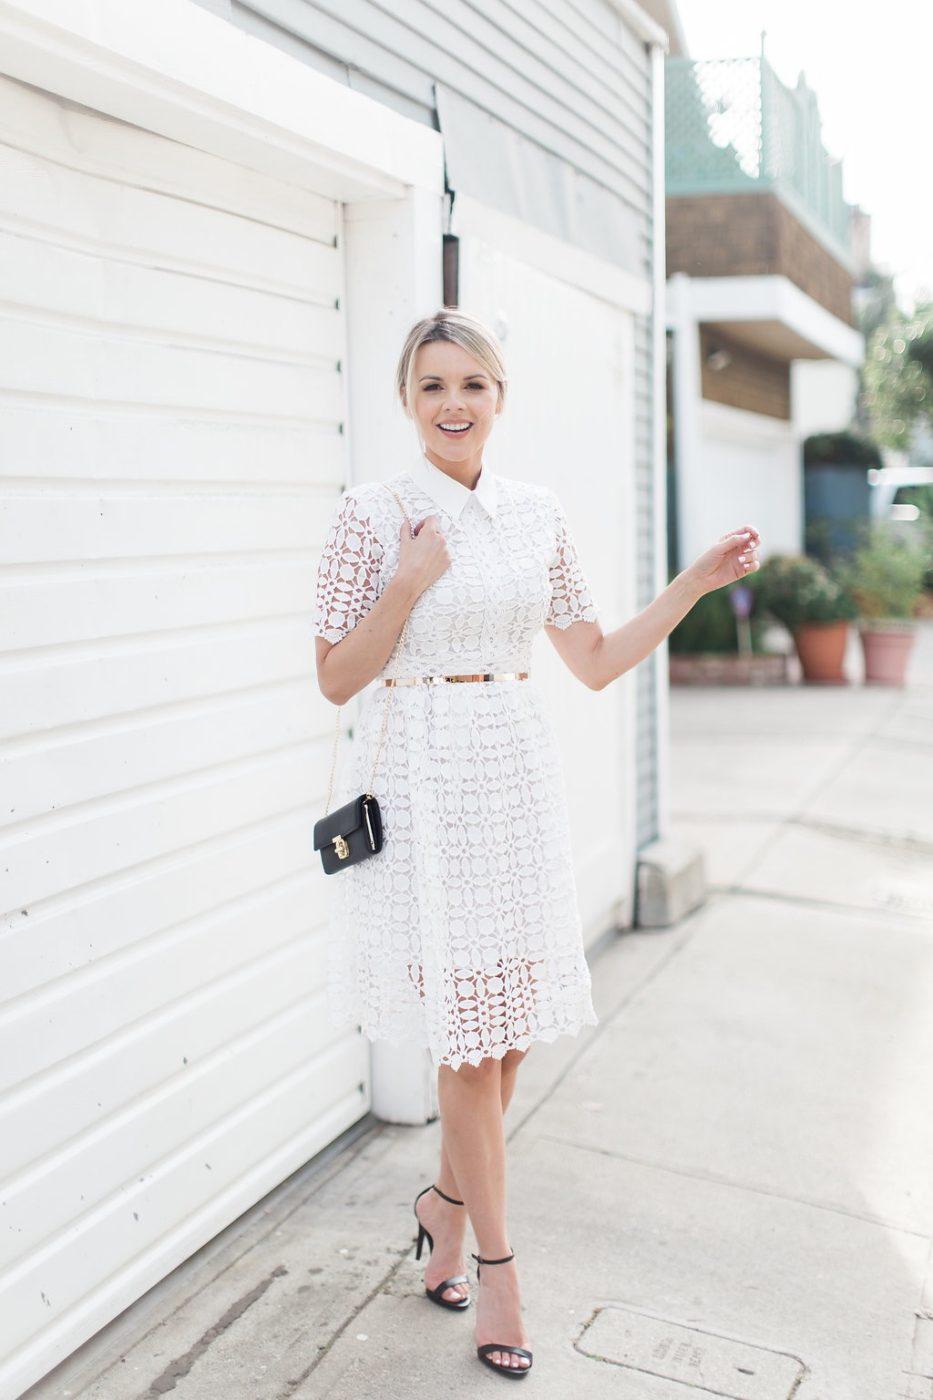 Wedding White Lace Dress